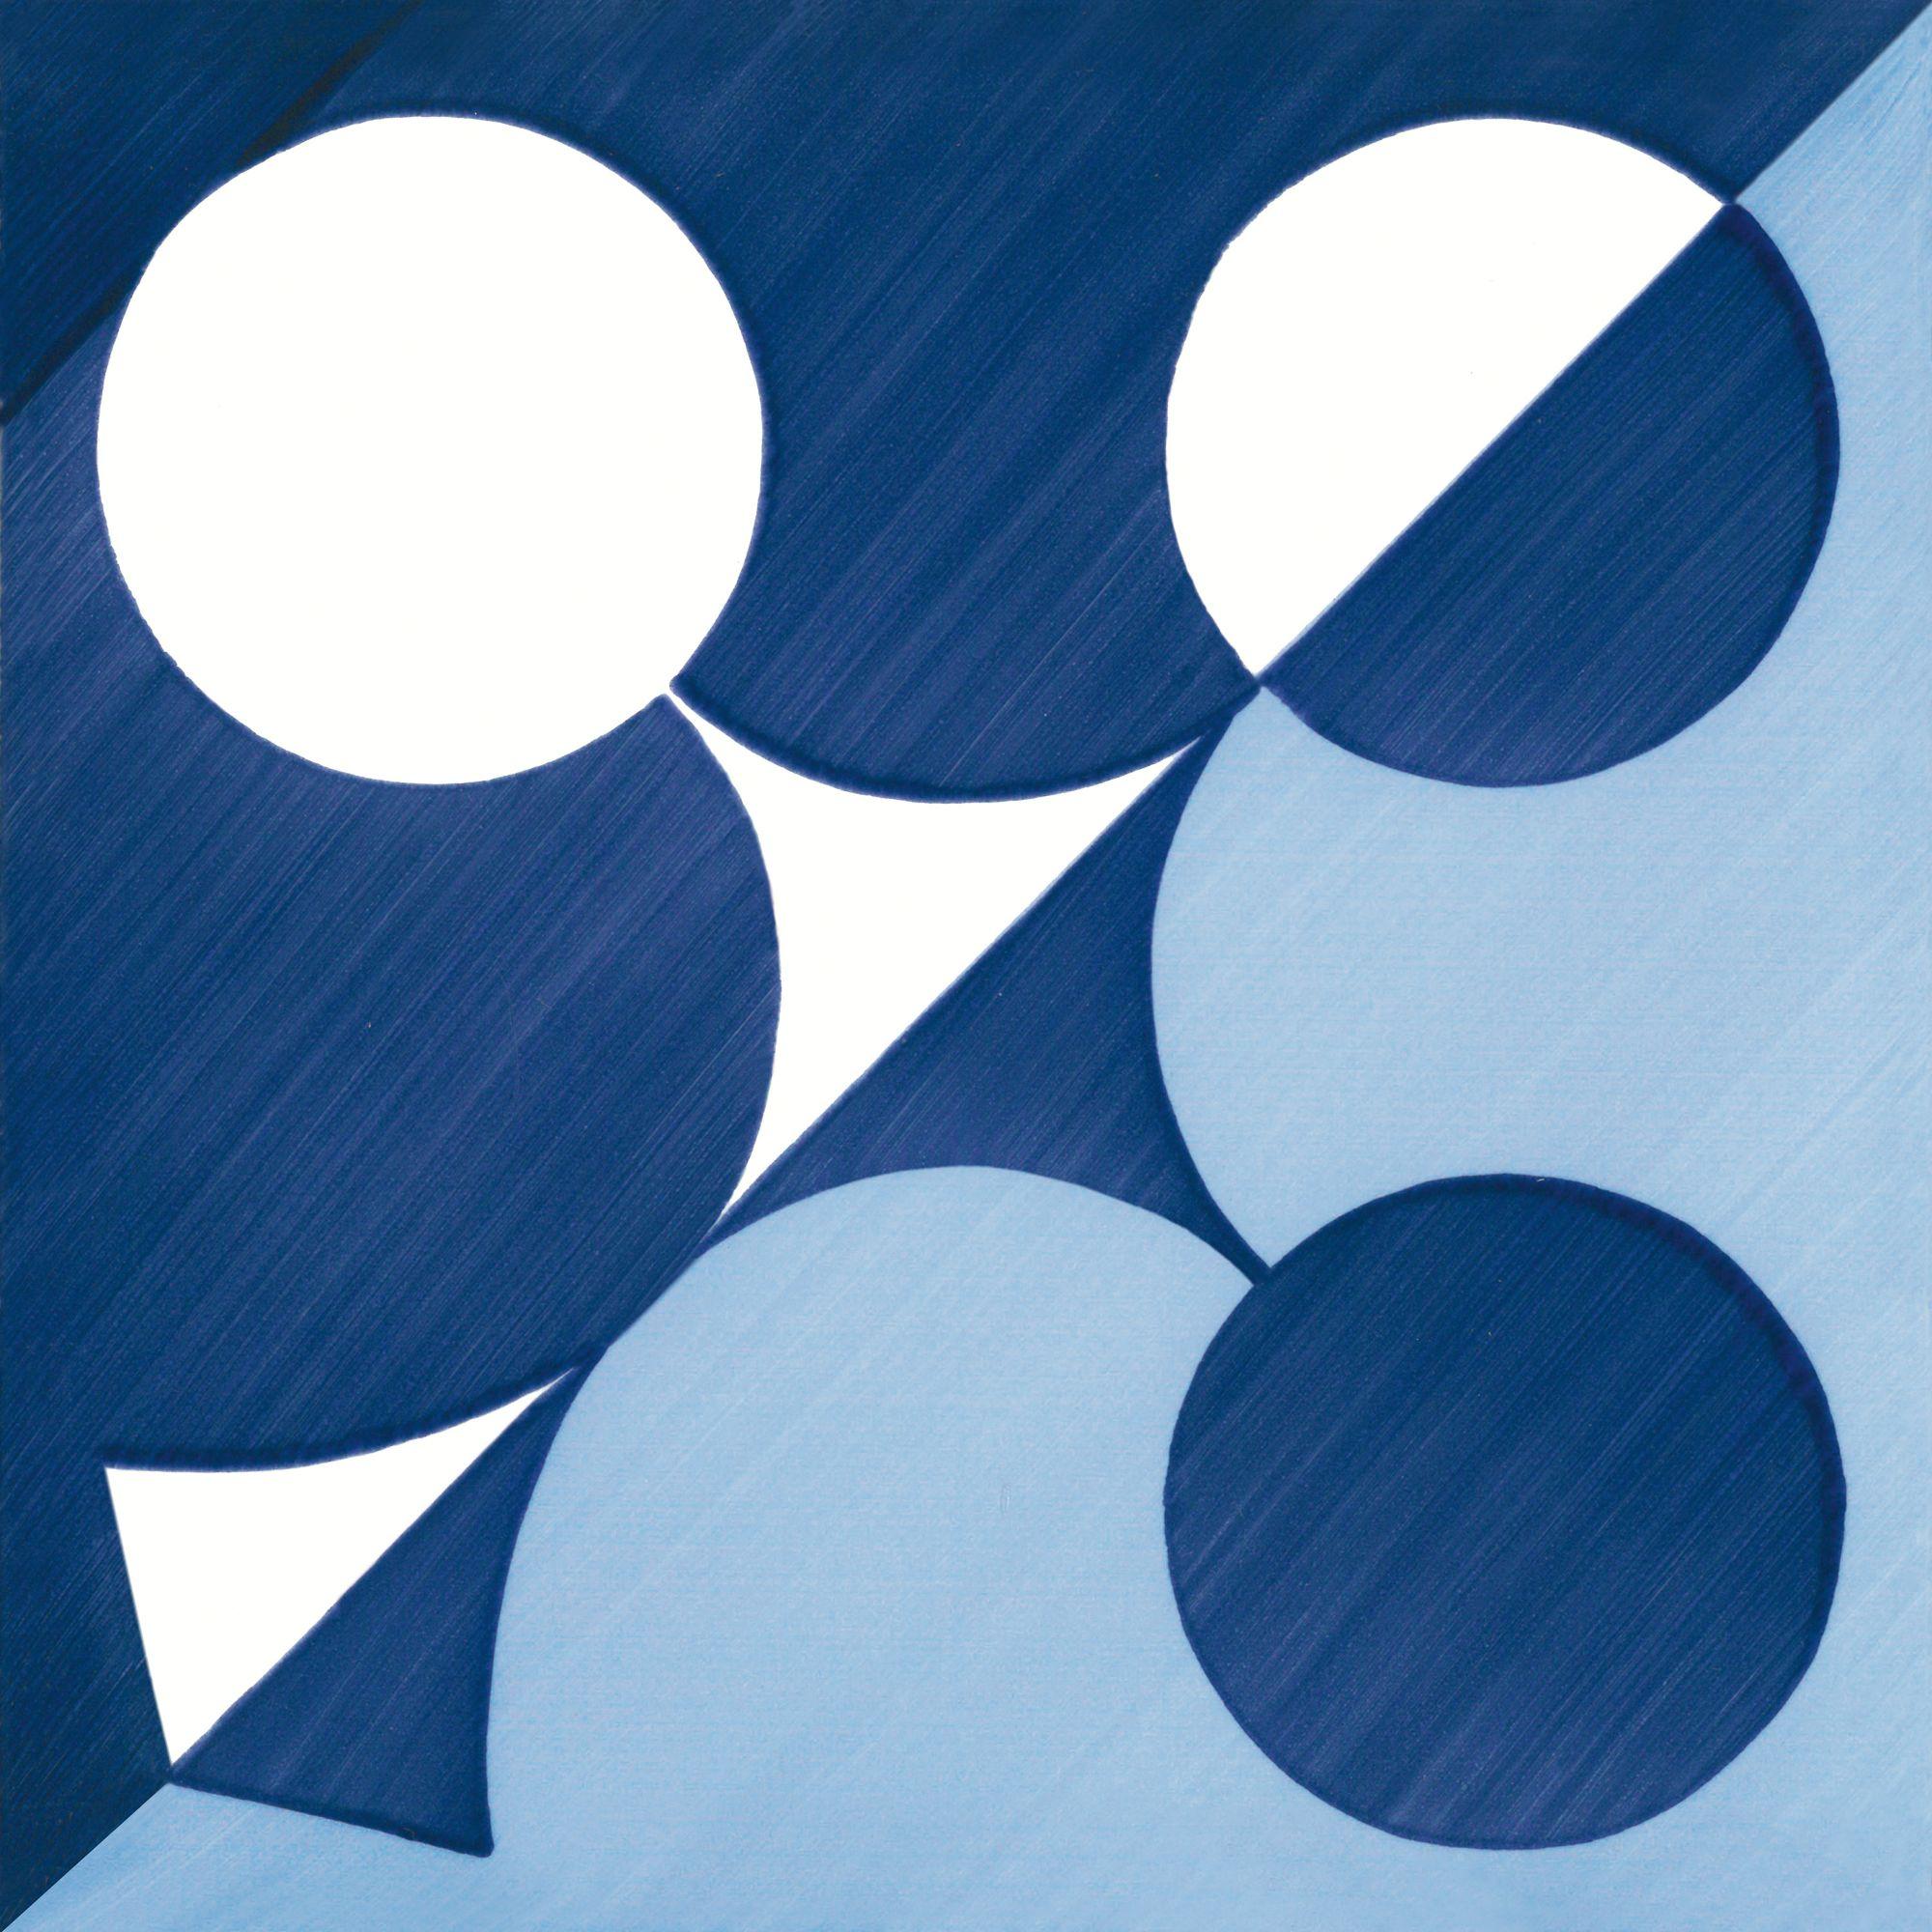 blu-ponti-decoro-tipo-23